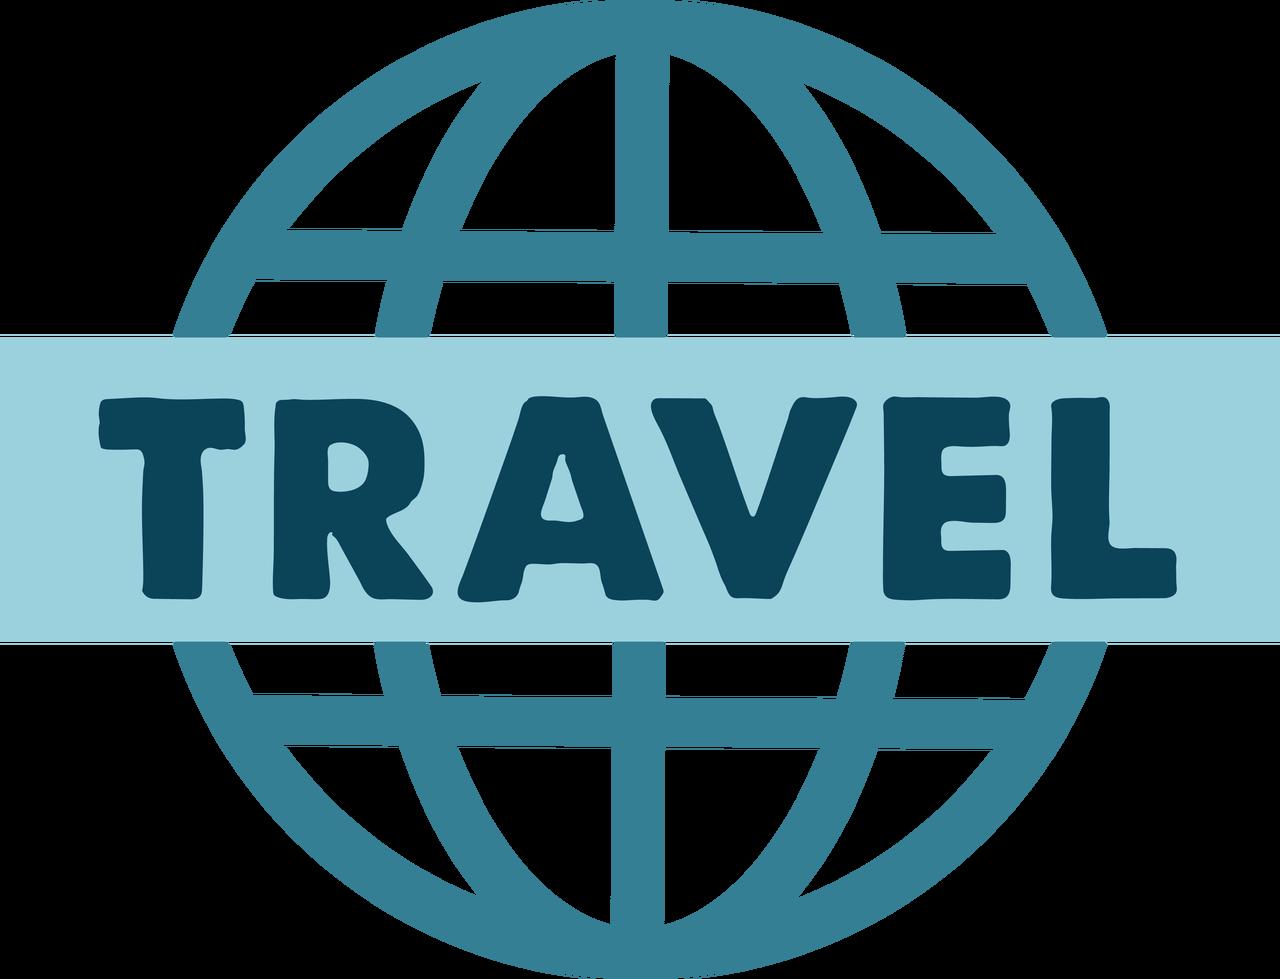 Travel SVG Cut File